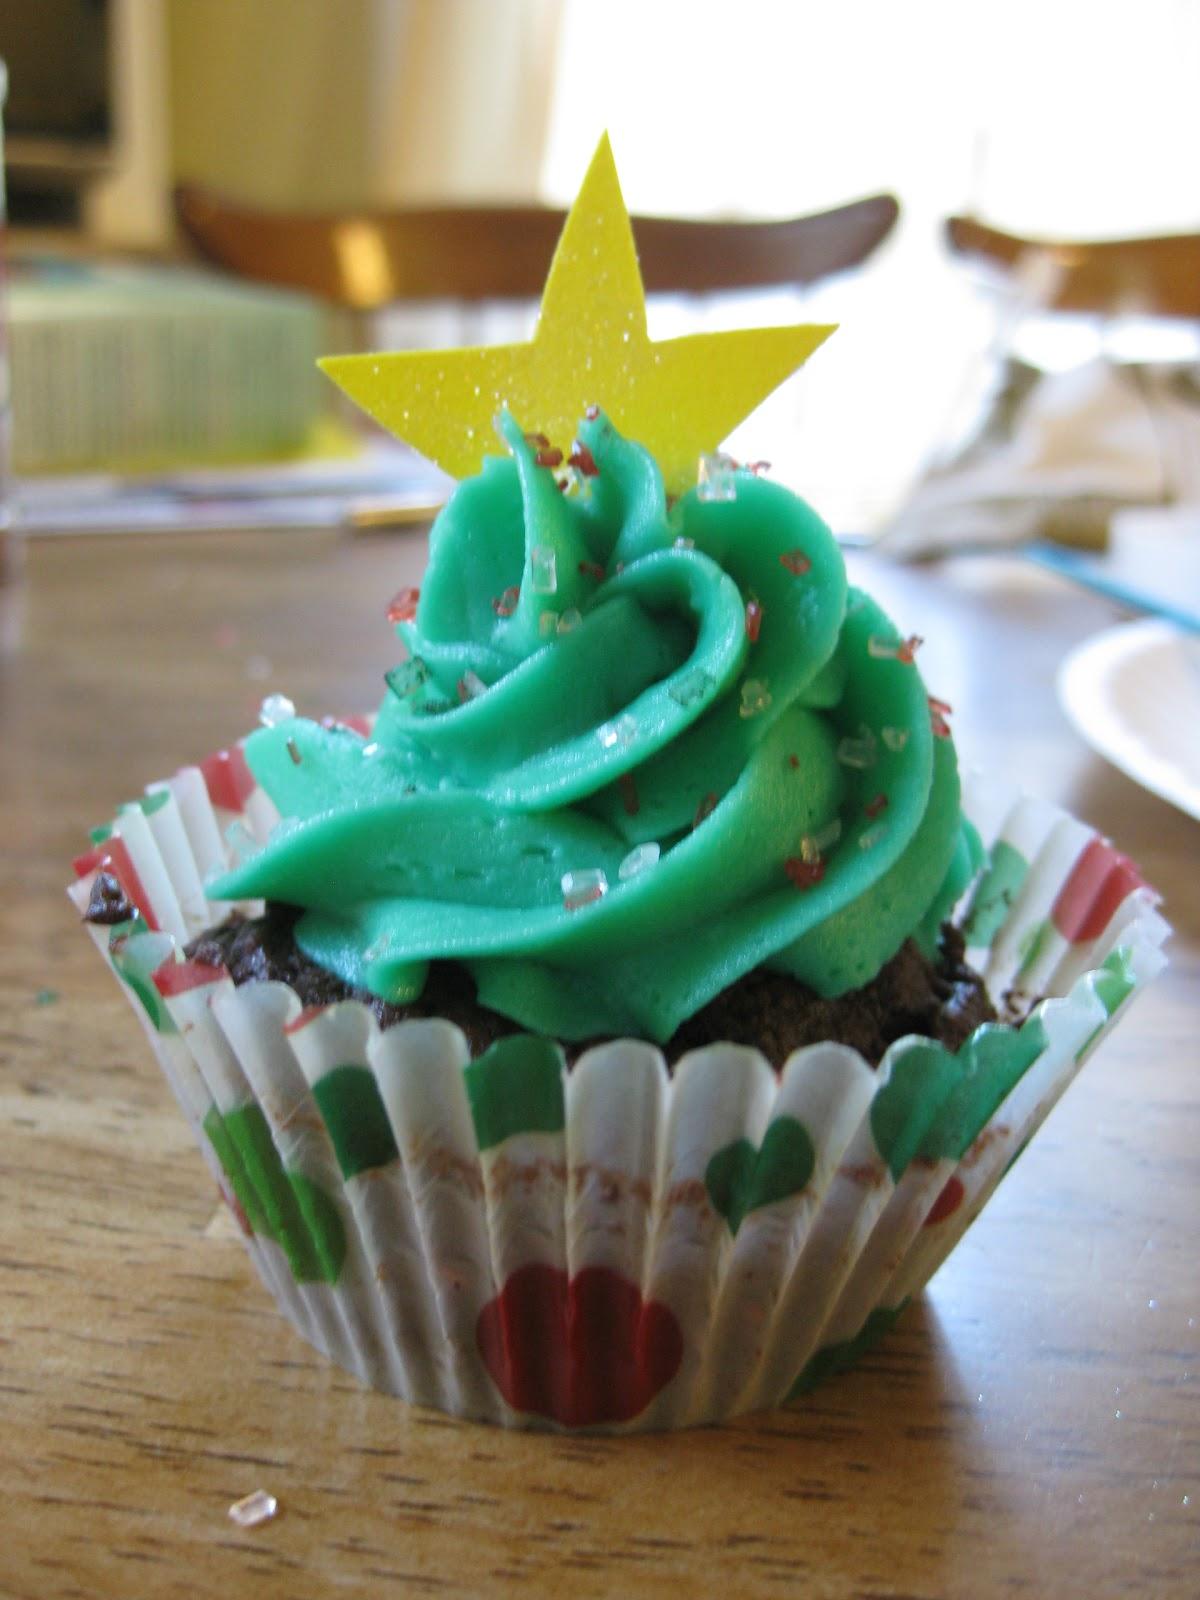 ThisIsWhyKtcIsHot: Christmas Tree Cupcakes